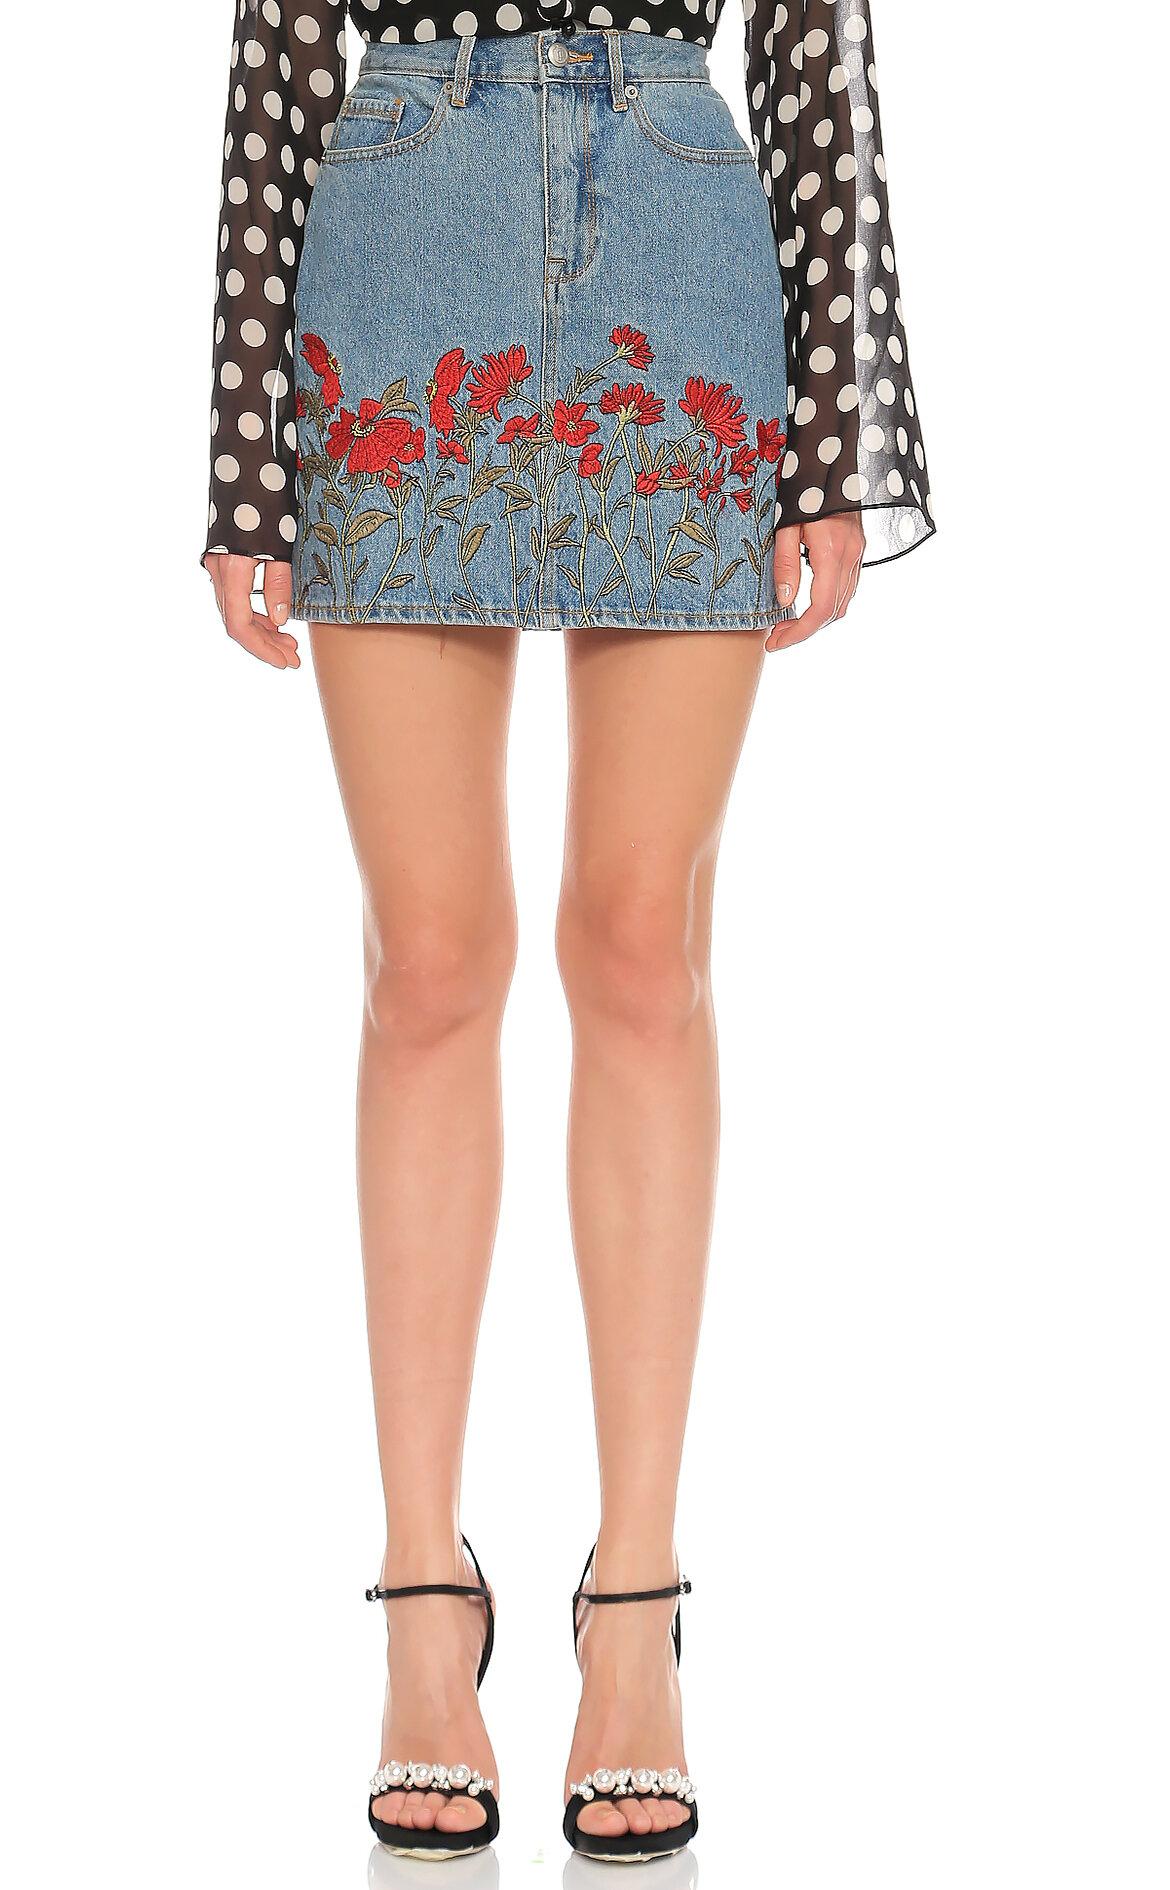 Juicy Couture-Juicy Couture İşleme Detaylı Jean Mavi Etek